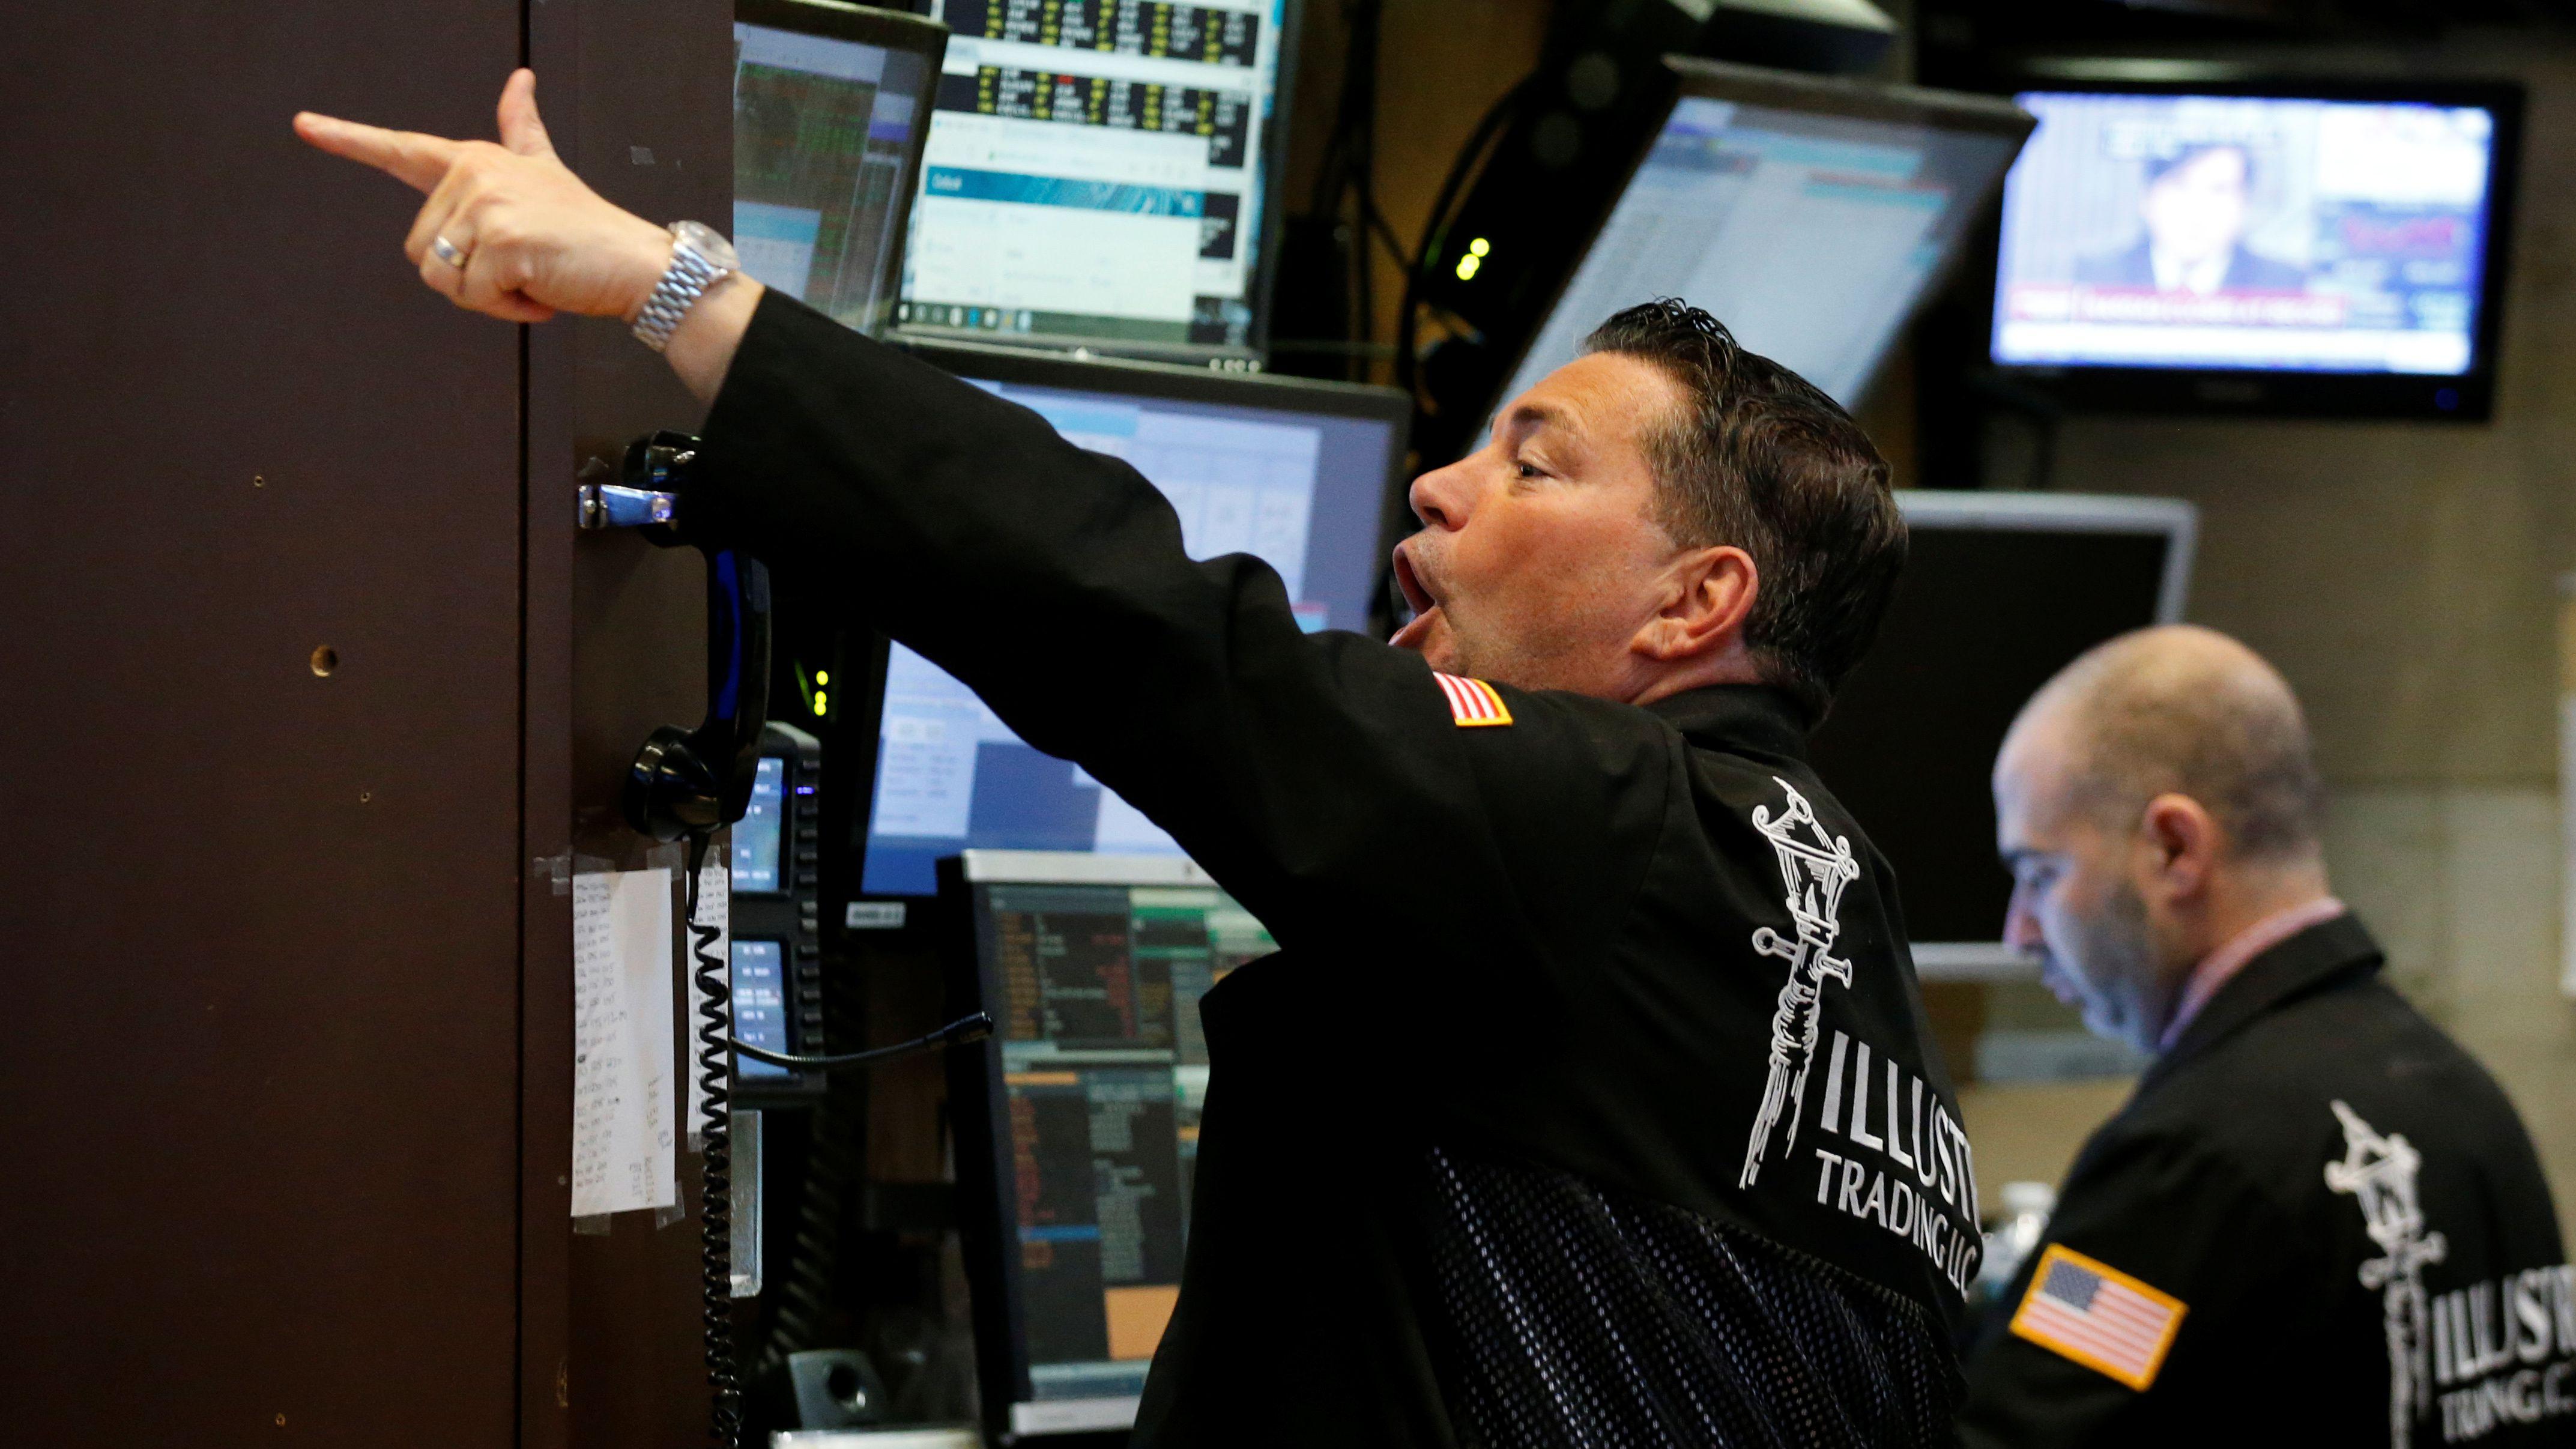 Traders work on the floor of the New York Stock Exchange (NYSE) in New York, U.S., February 7, 2017. REUTERS/Brendan McDermid